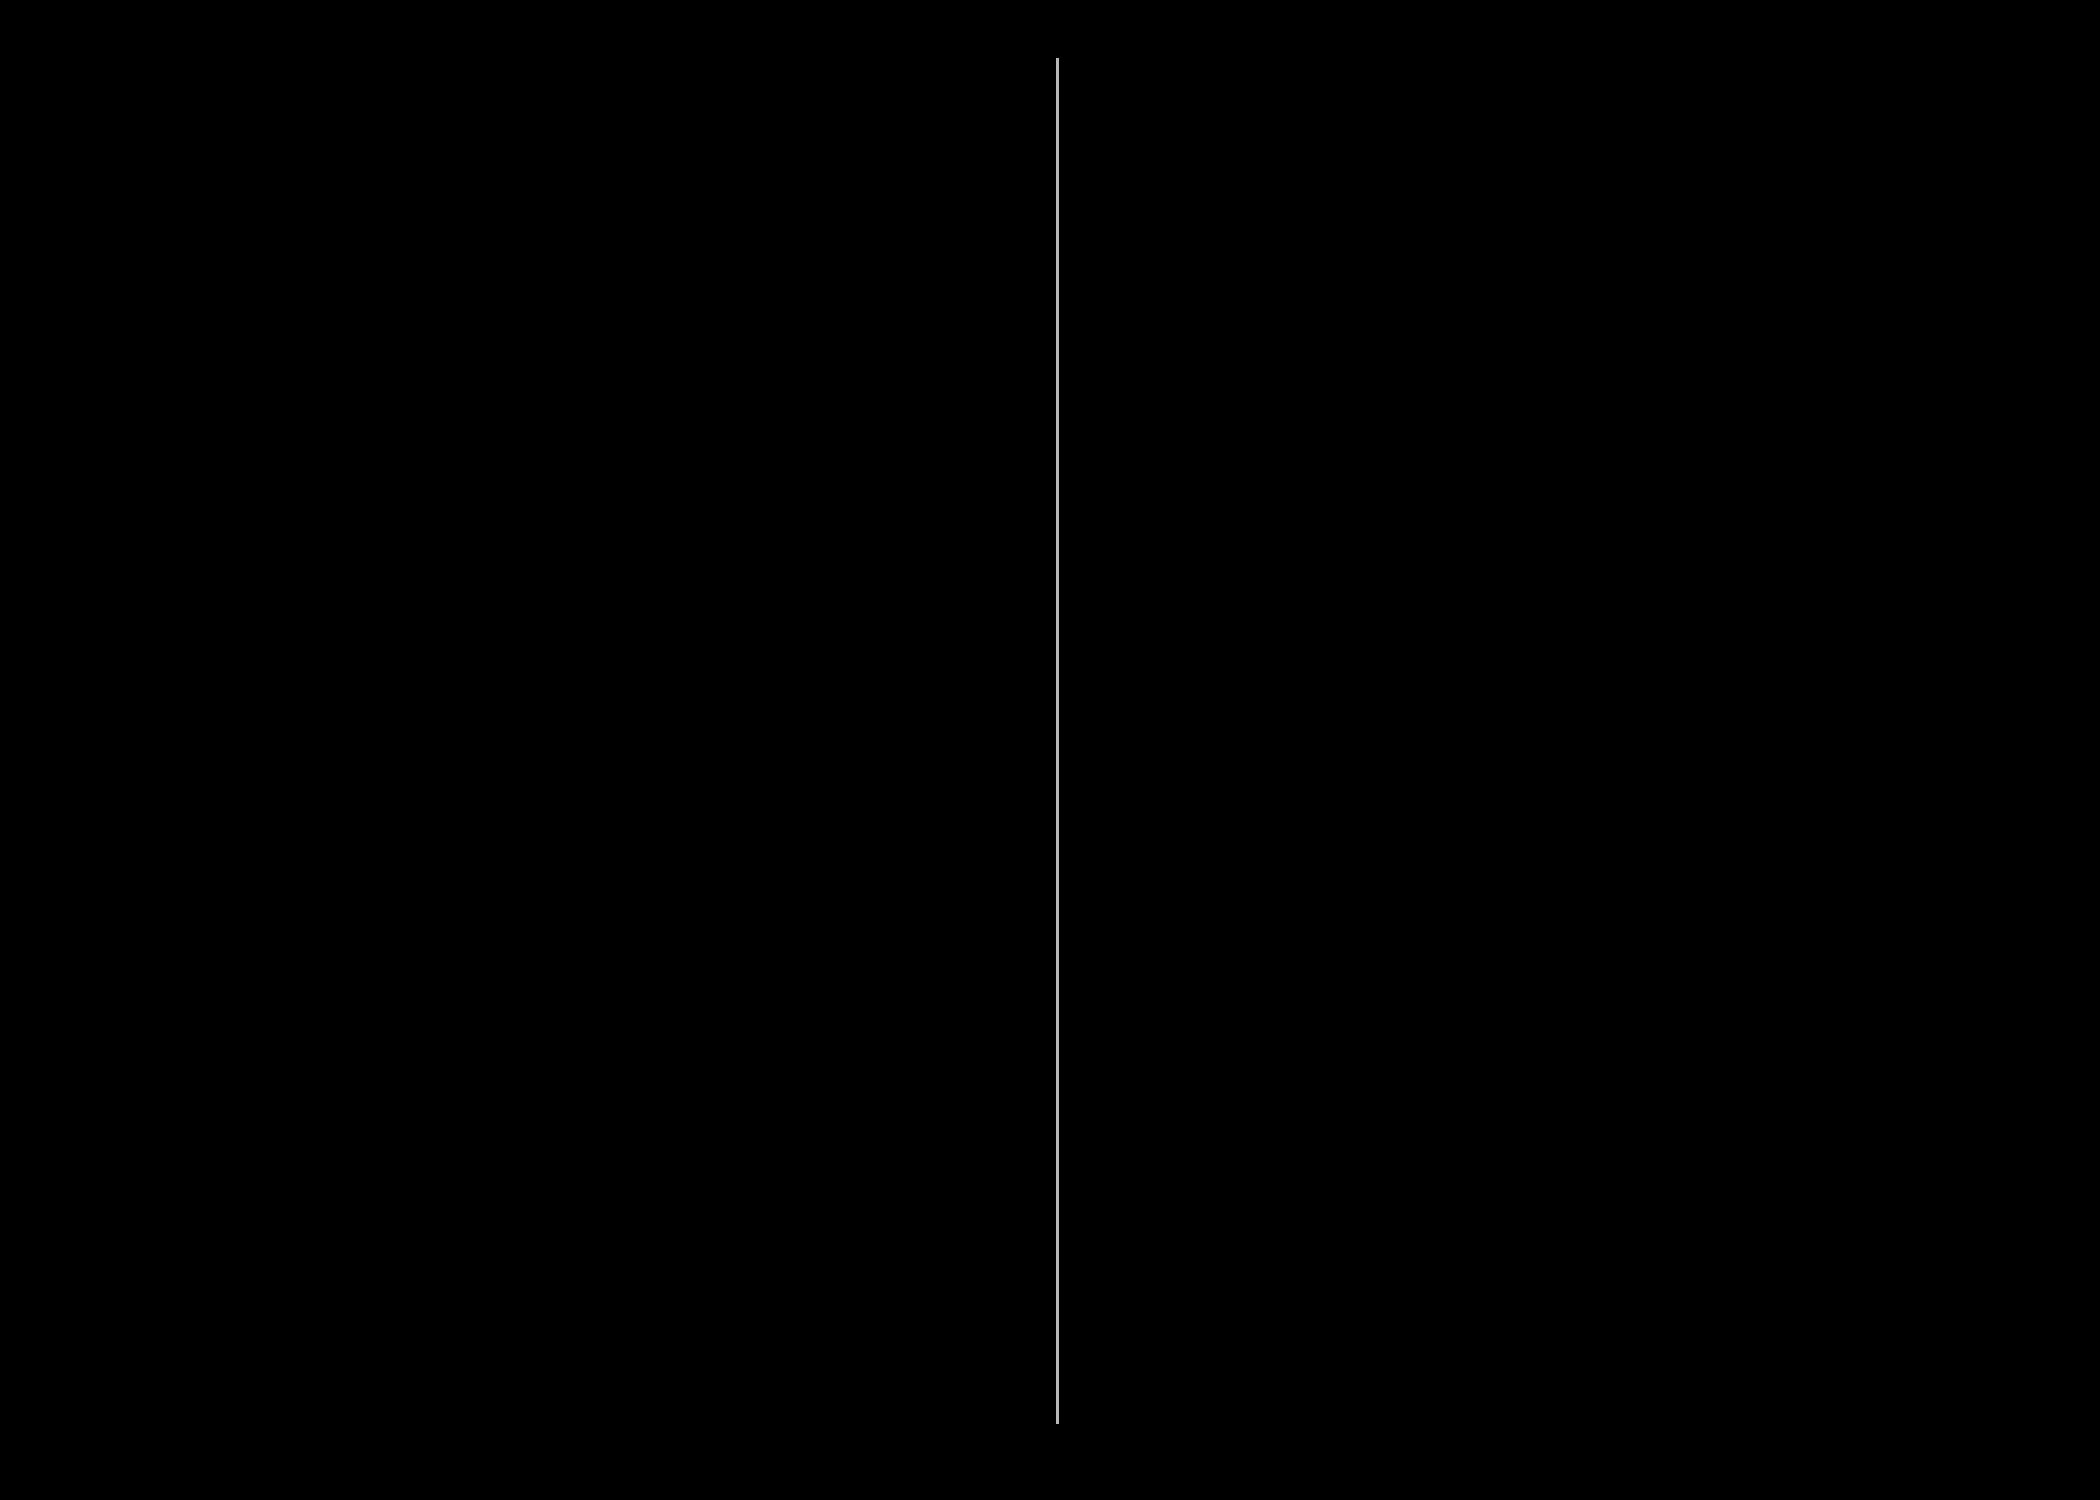 vertial line.png